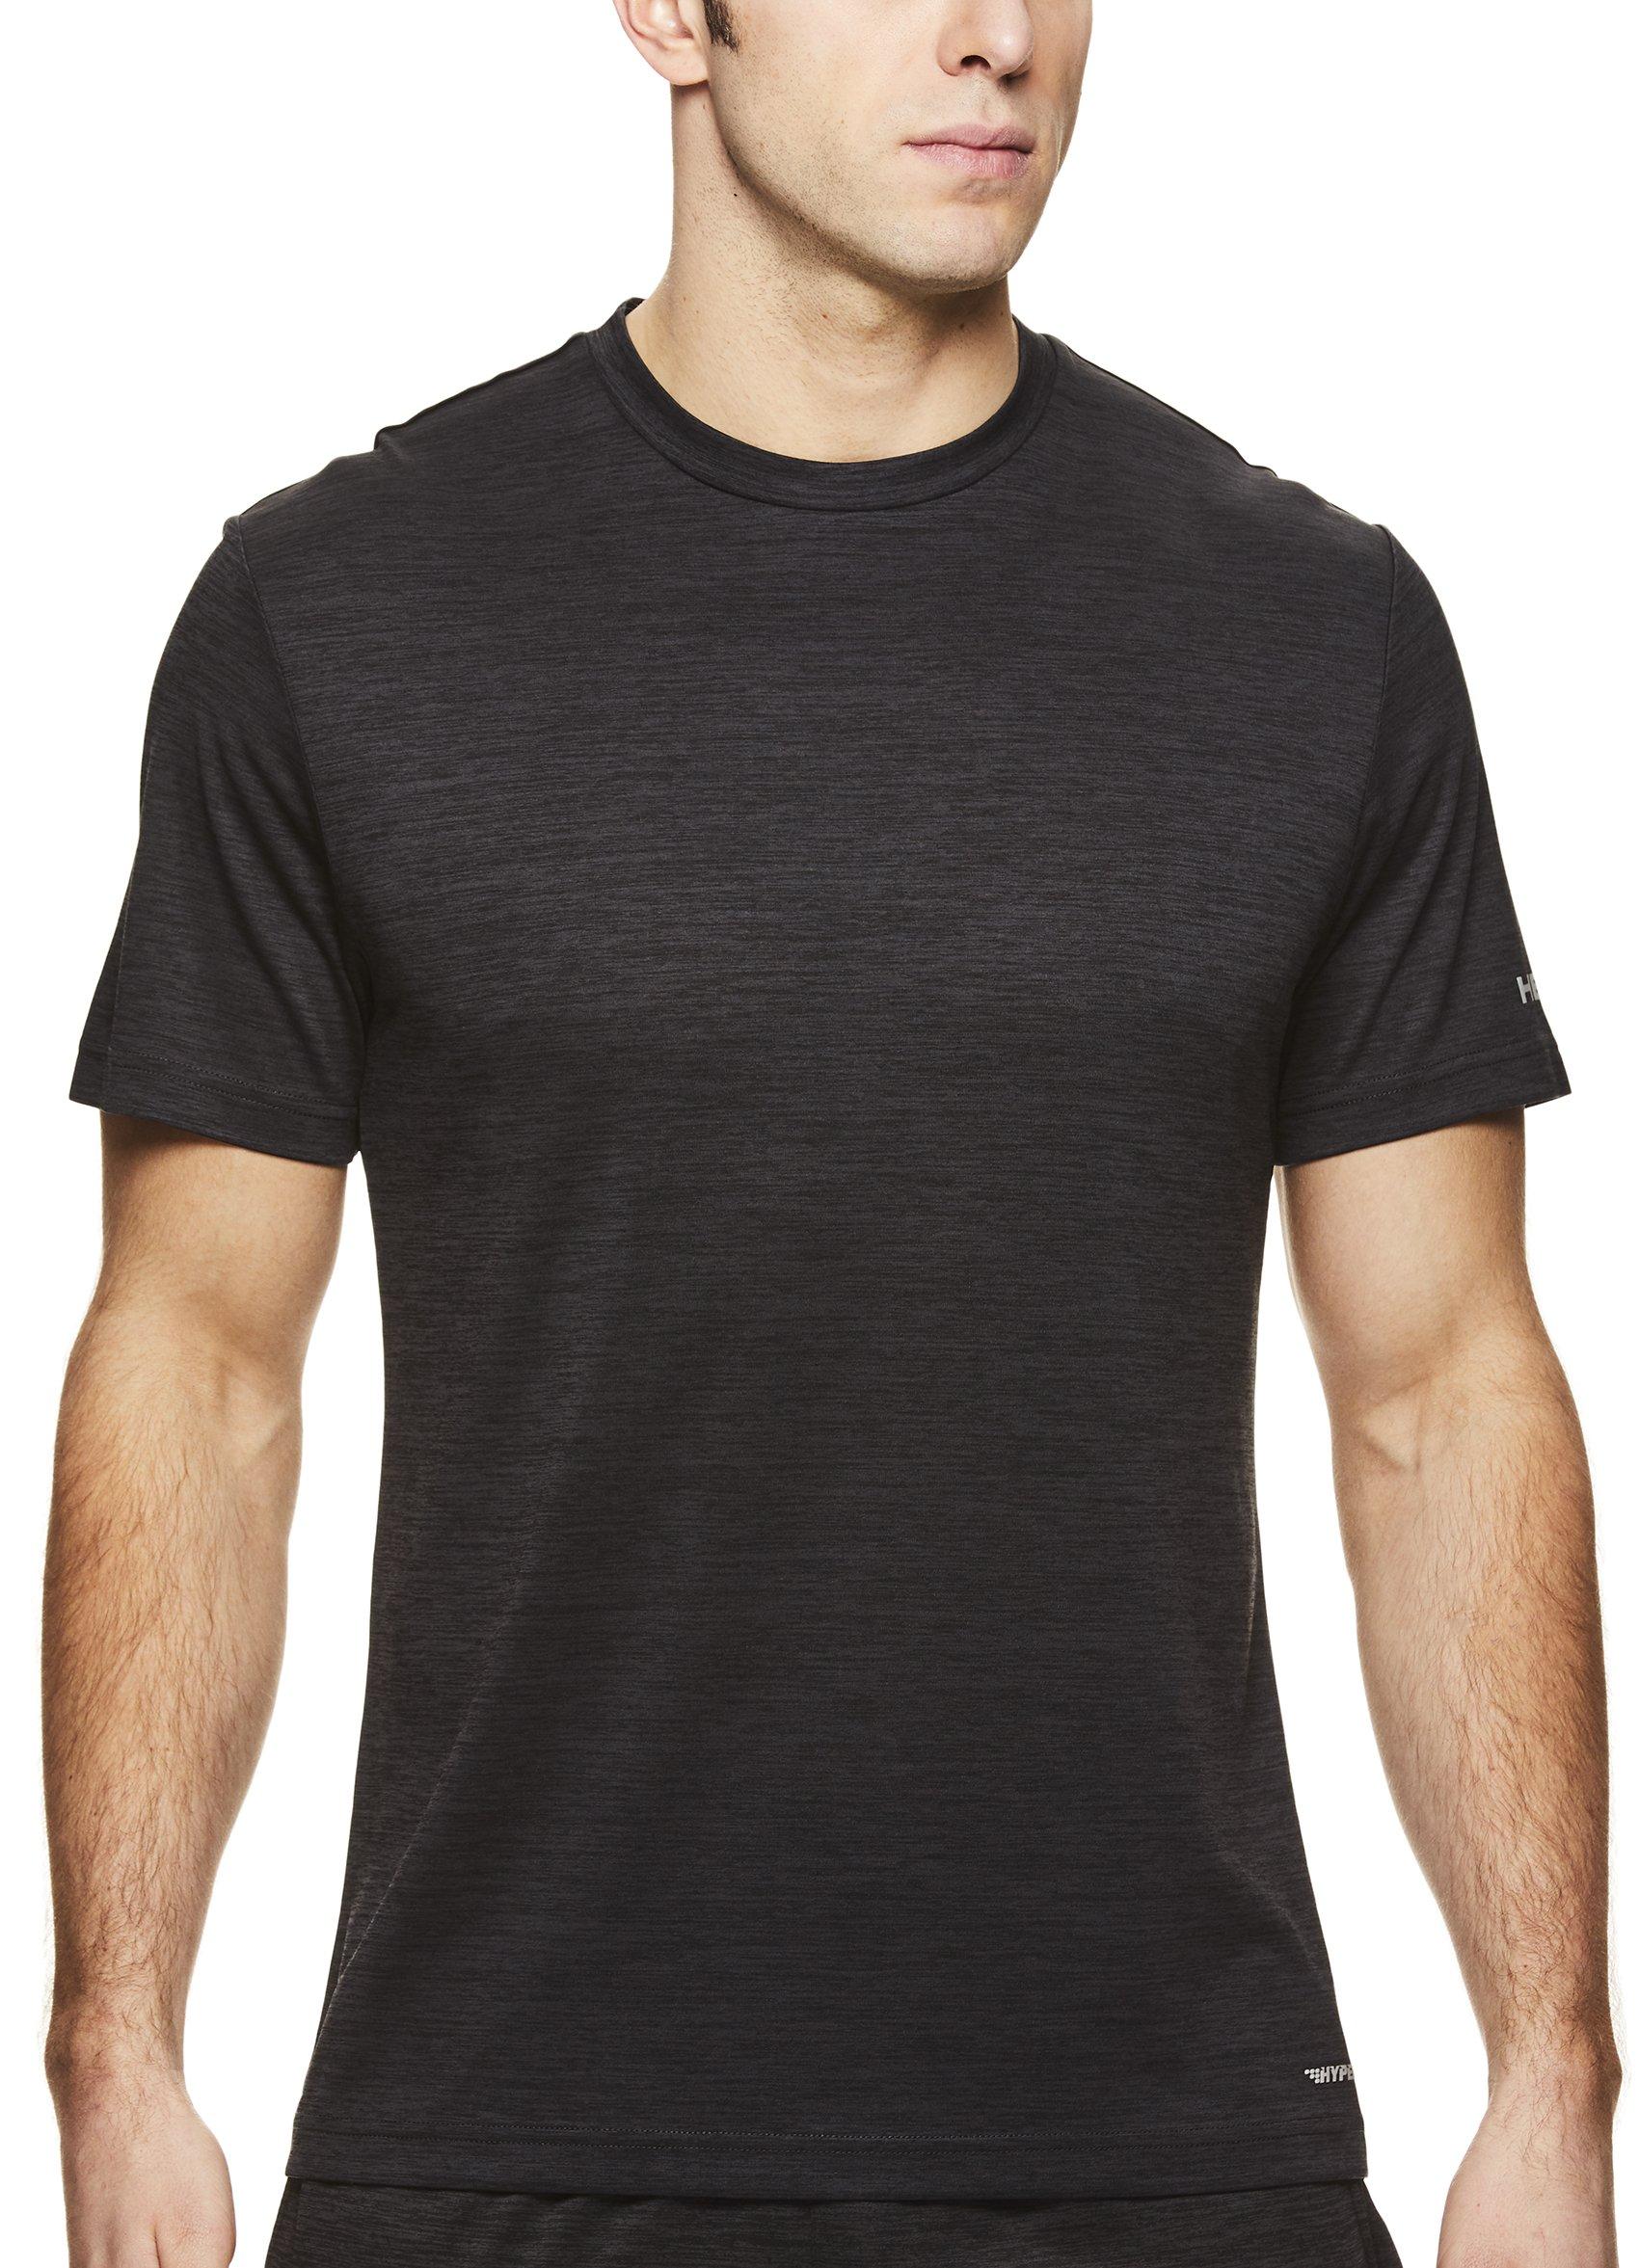 HEAD Men's Ultra Hypertek Crewneck Gym Training & Workout T-Shirt - Short Sleeve Activewear Top - Ultra Black Heather, Small